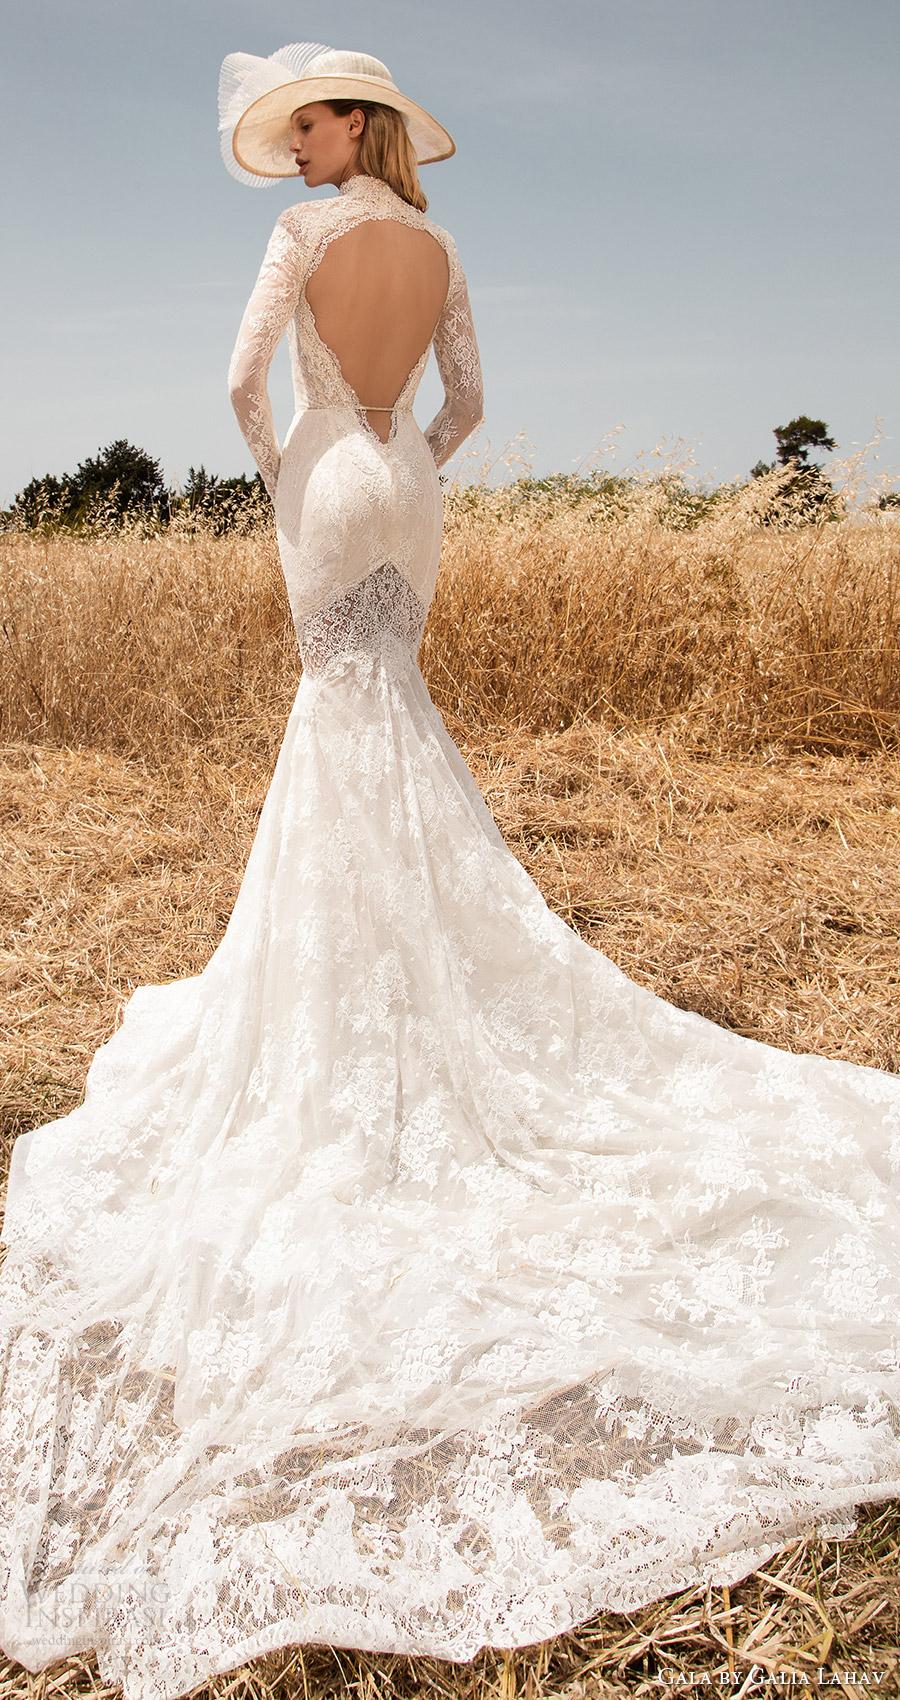 traje de gala galia Lahav primavera 2017 mangas largas ilusión de profundidad vneck boda de la sirena del cordón (701) bv ojo de la cerradura tren de retorno a largo